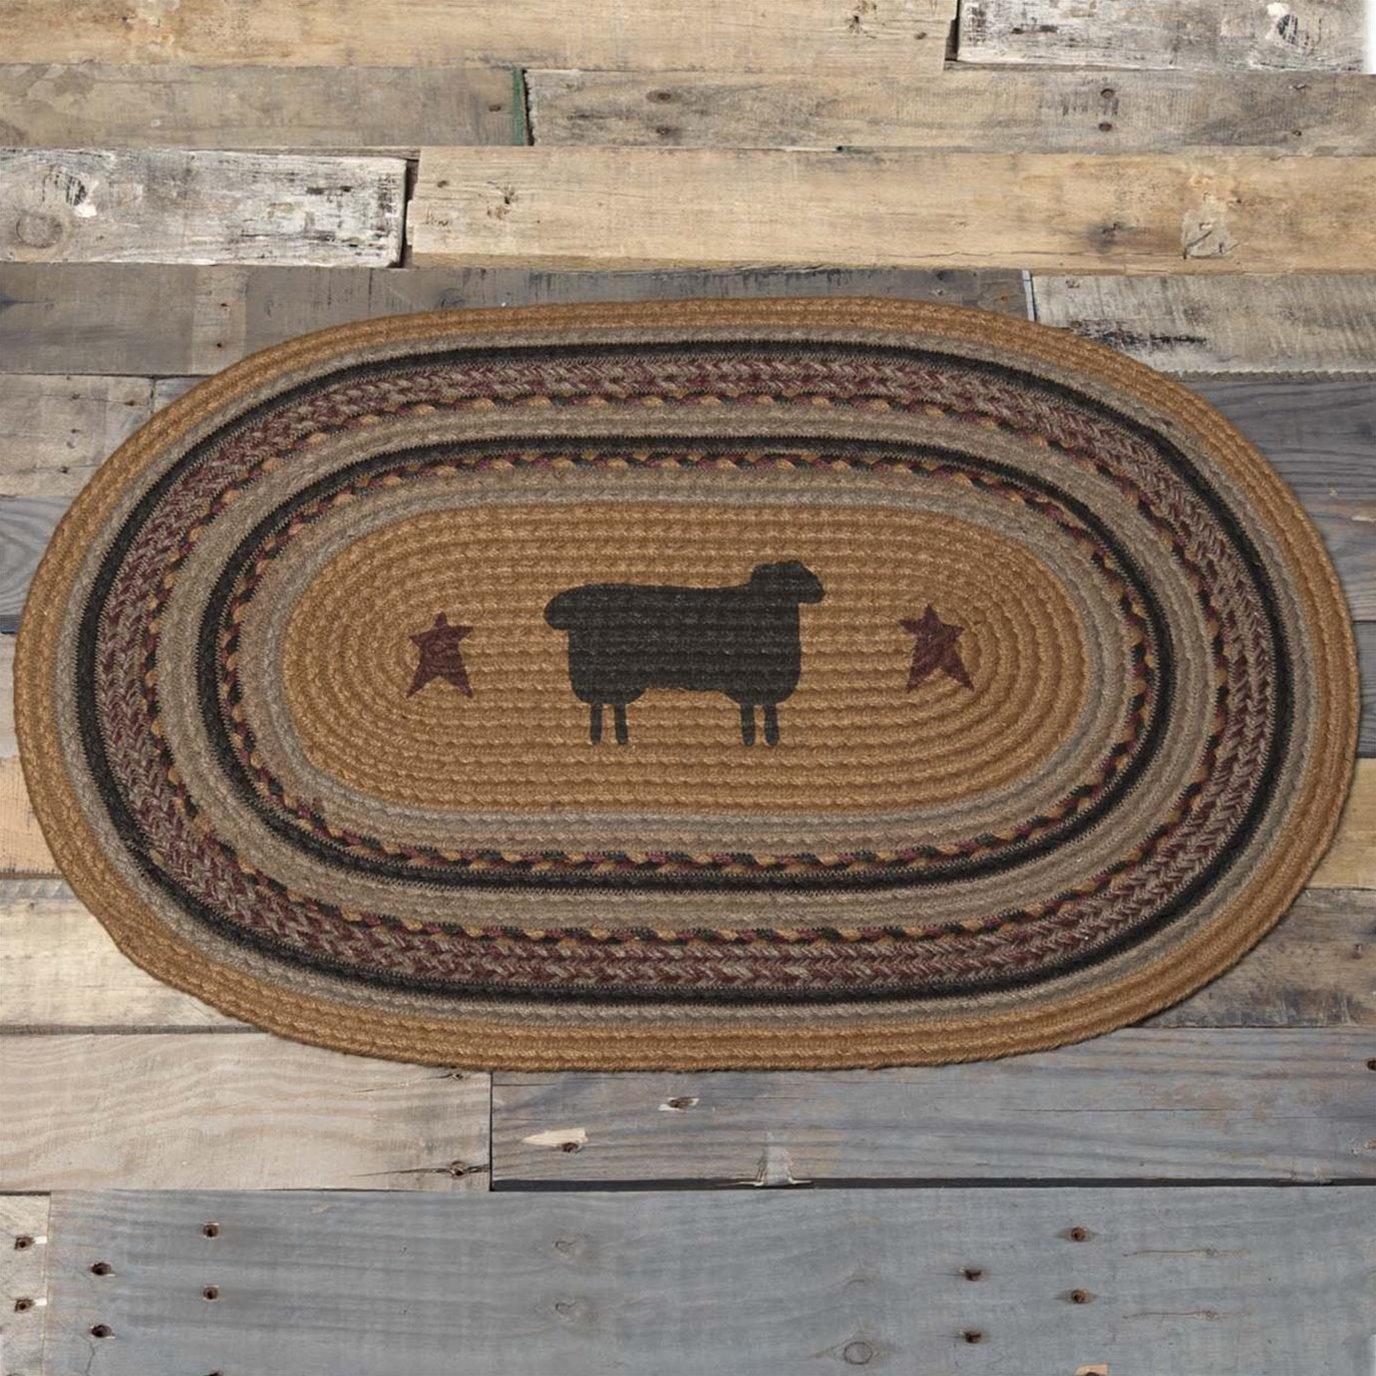 Heritage Farms Sheep Jute Rug Oval 20x30